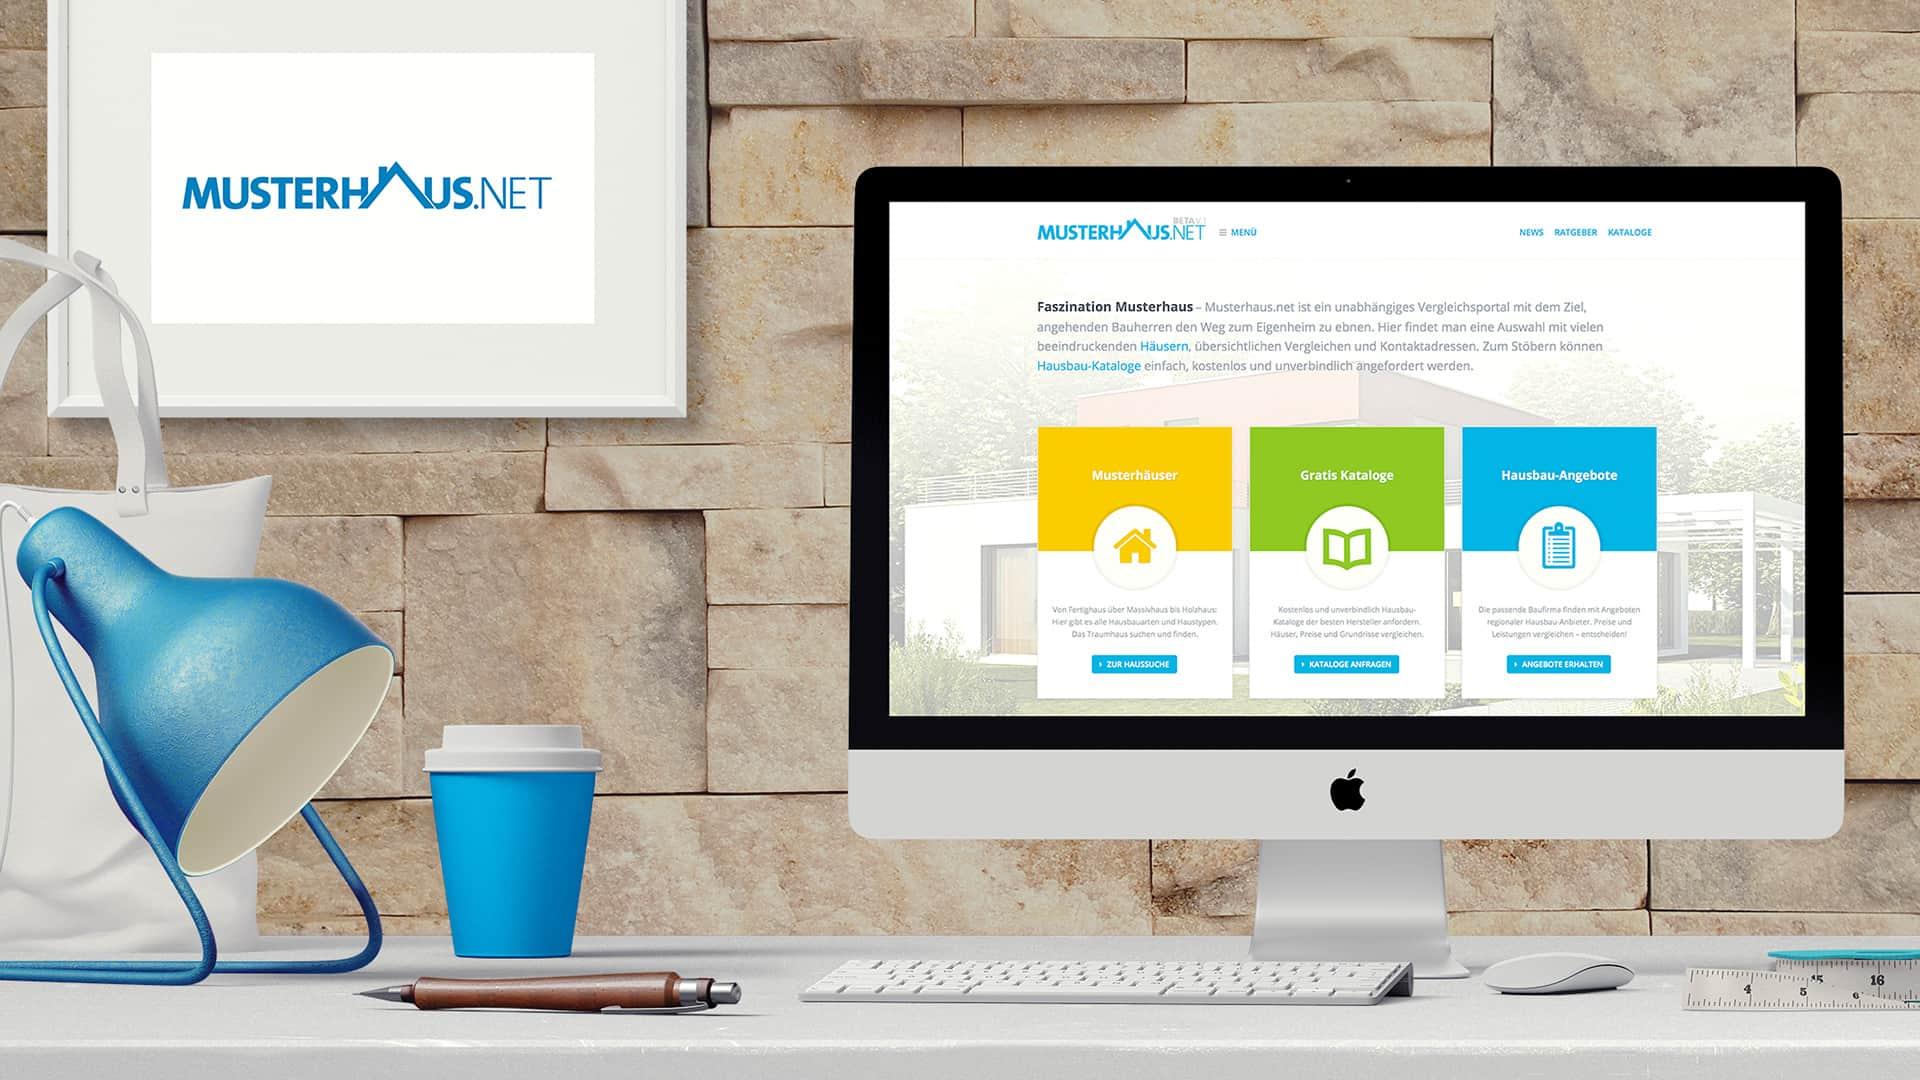 Musterhaus.net neues Design